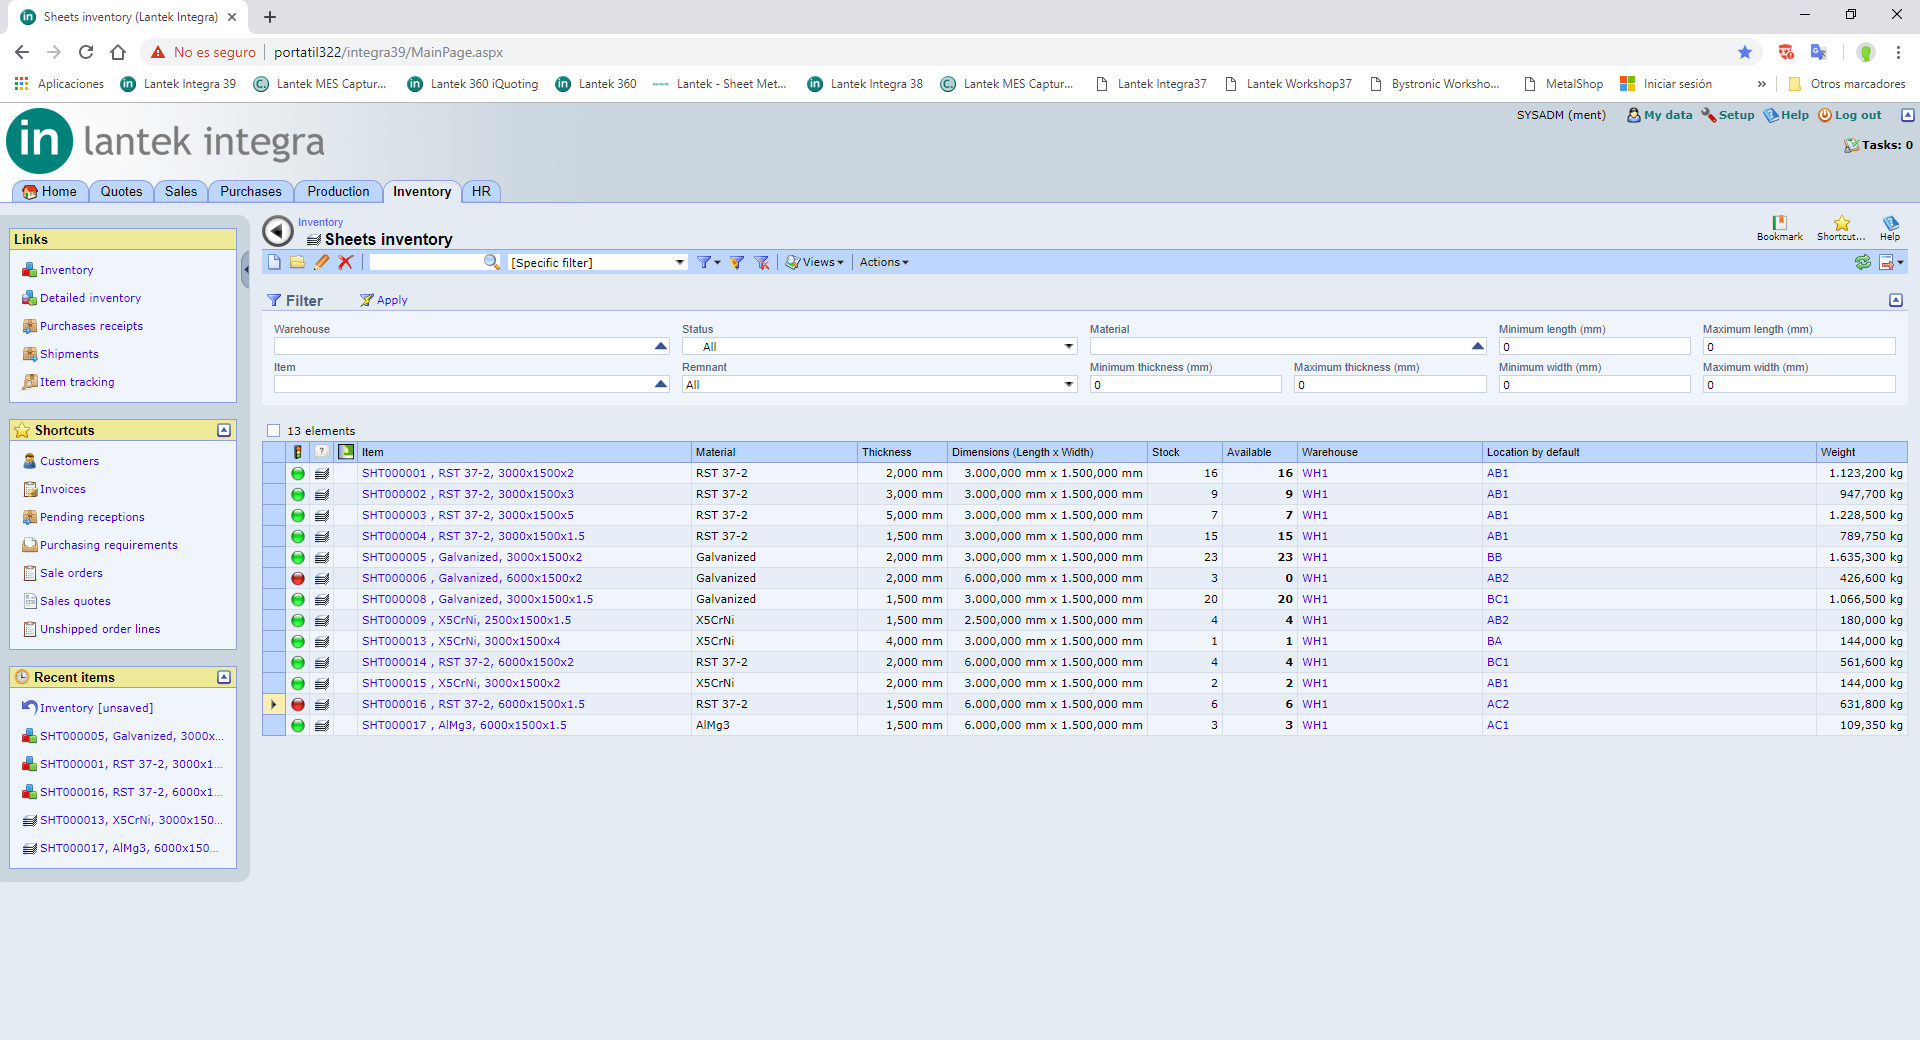 Lantek Integra Inventory  - Mouvements